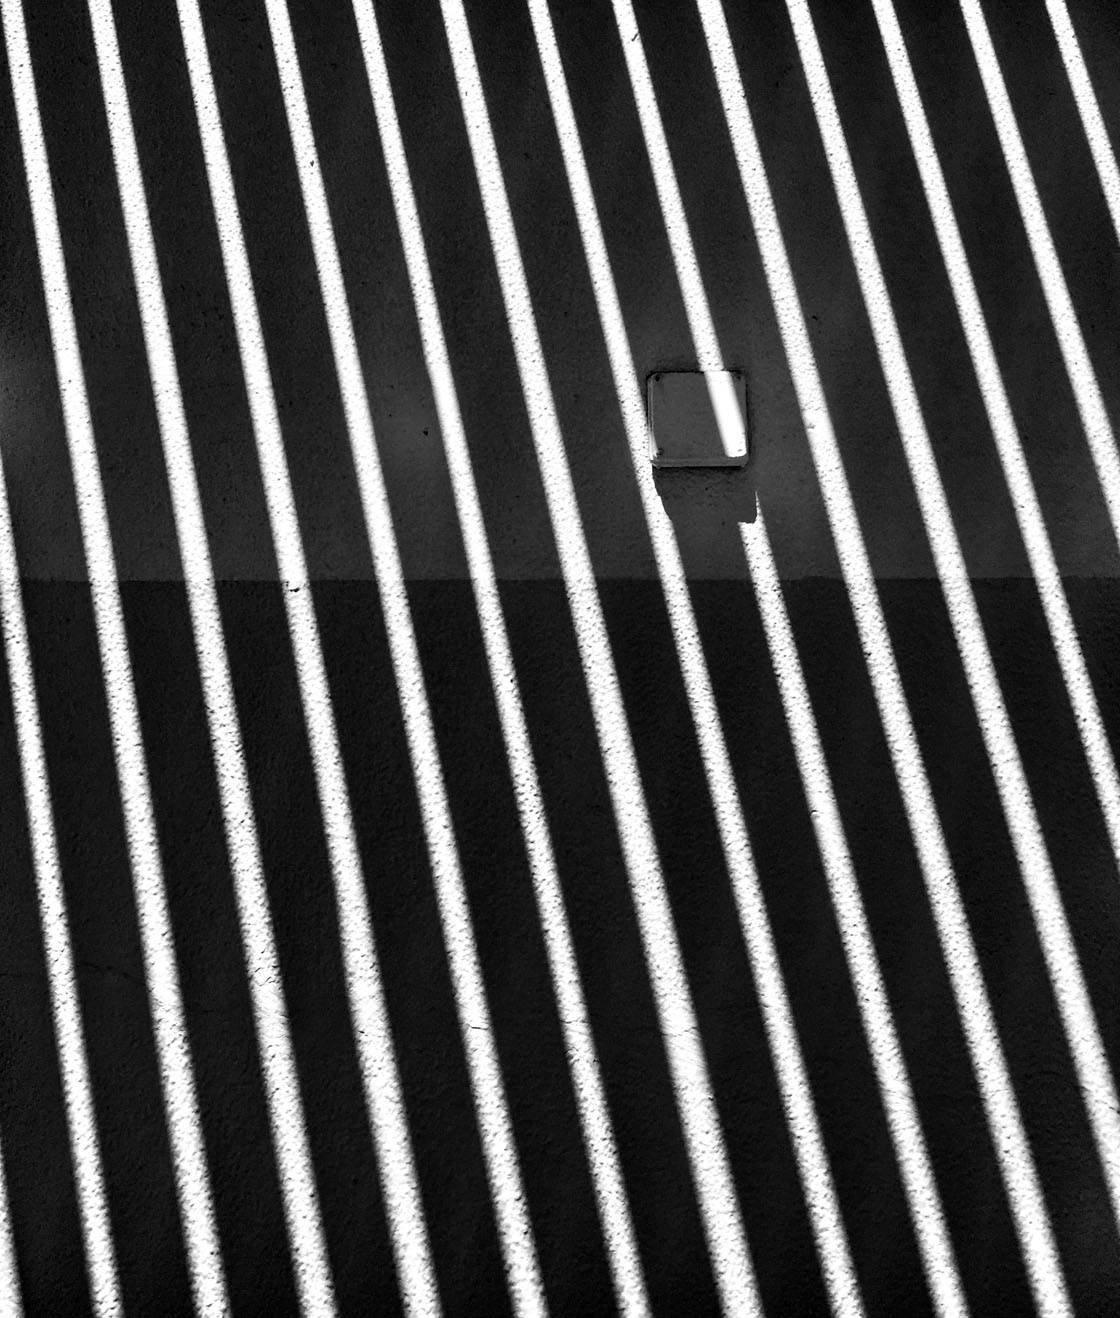 Leading Lines iPhone Photos 31 no script